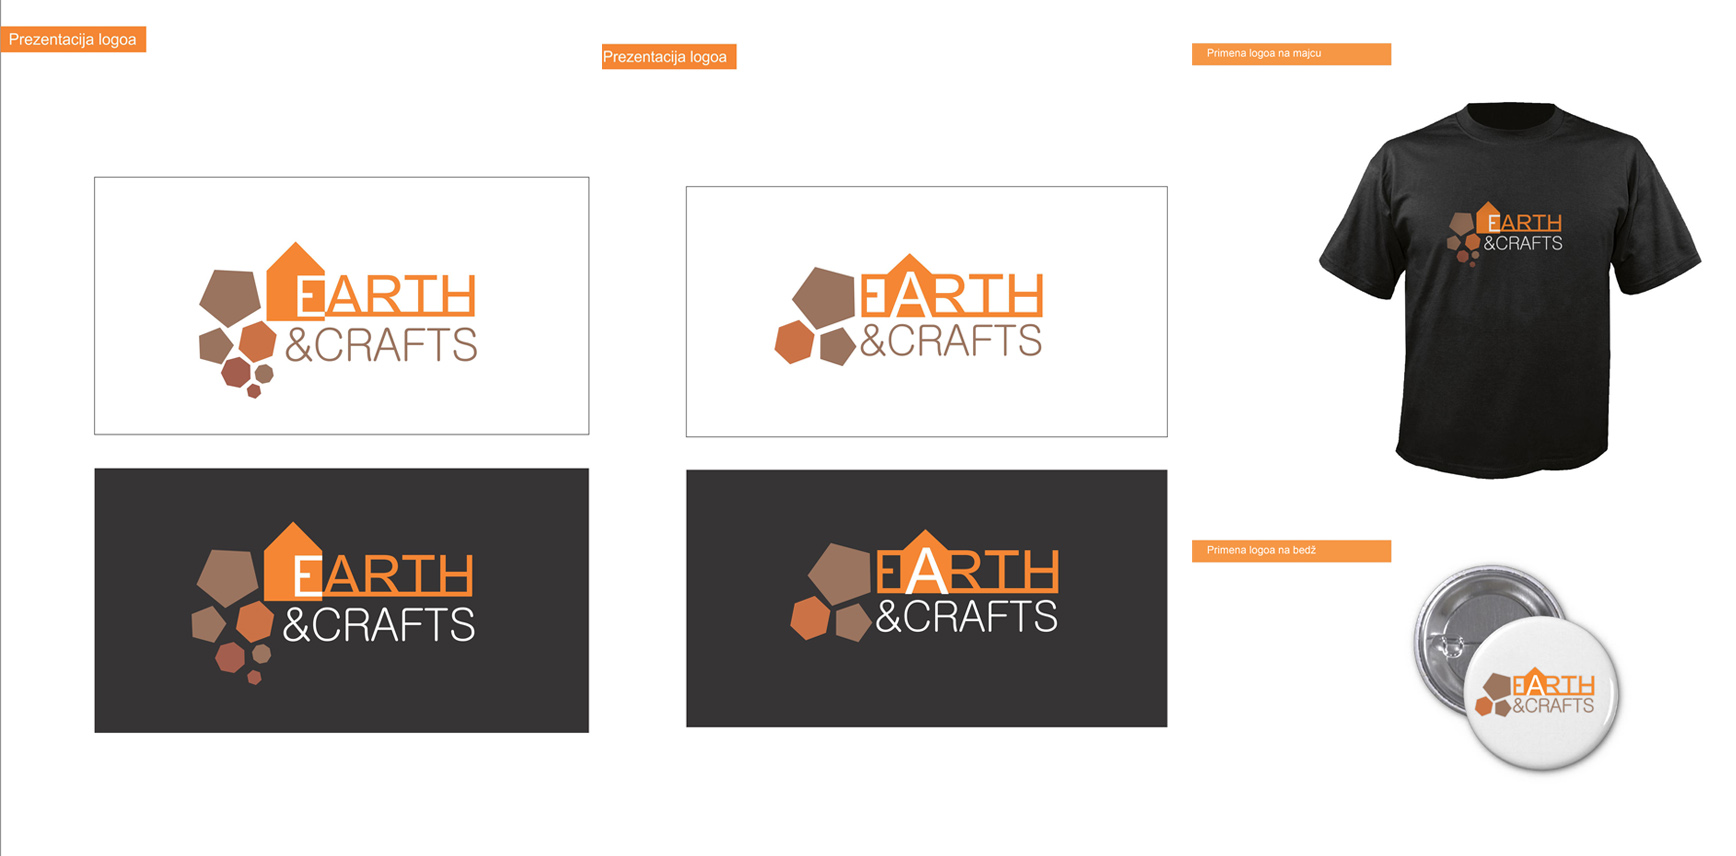 18 predlog logo EARTH&CRAFTS mia goranovic goranovic.mia@gmail.com